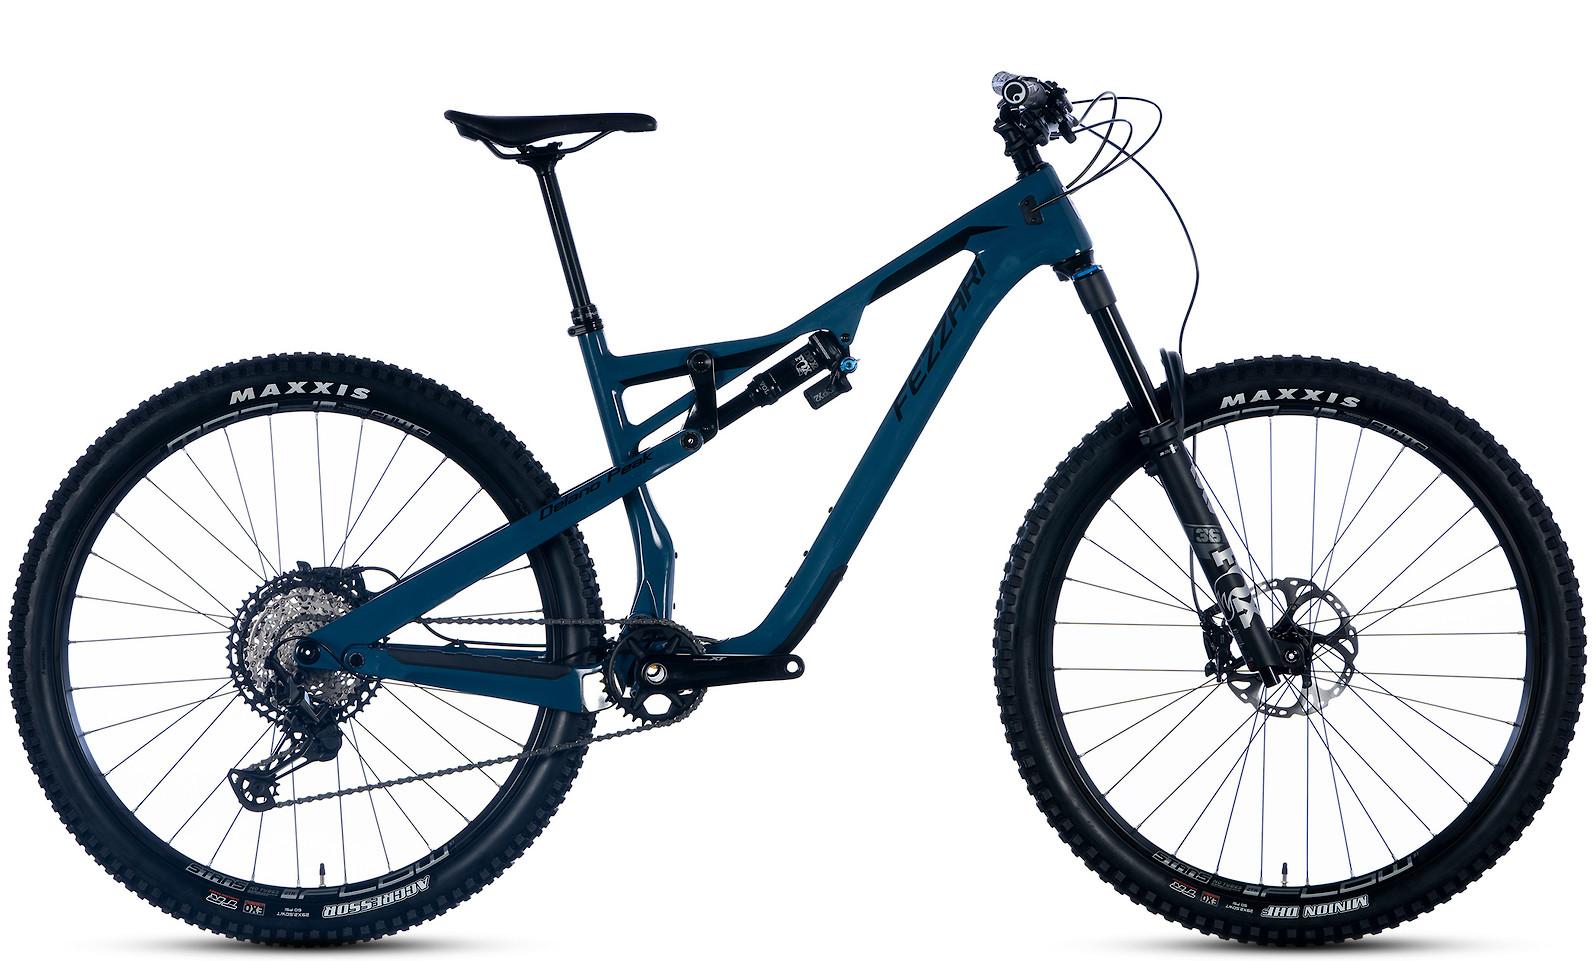 2020 Fezzari Delano Peak Elite (Blue)